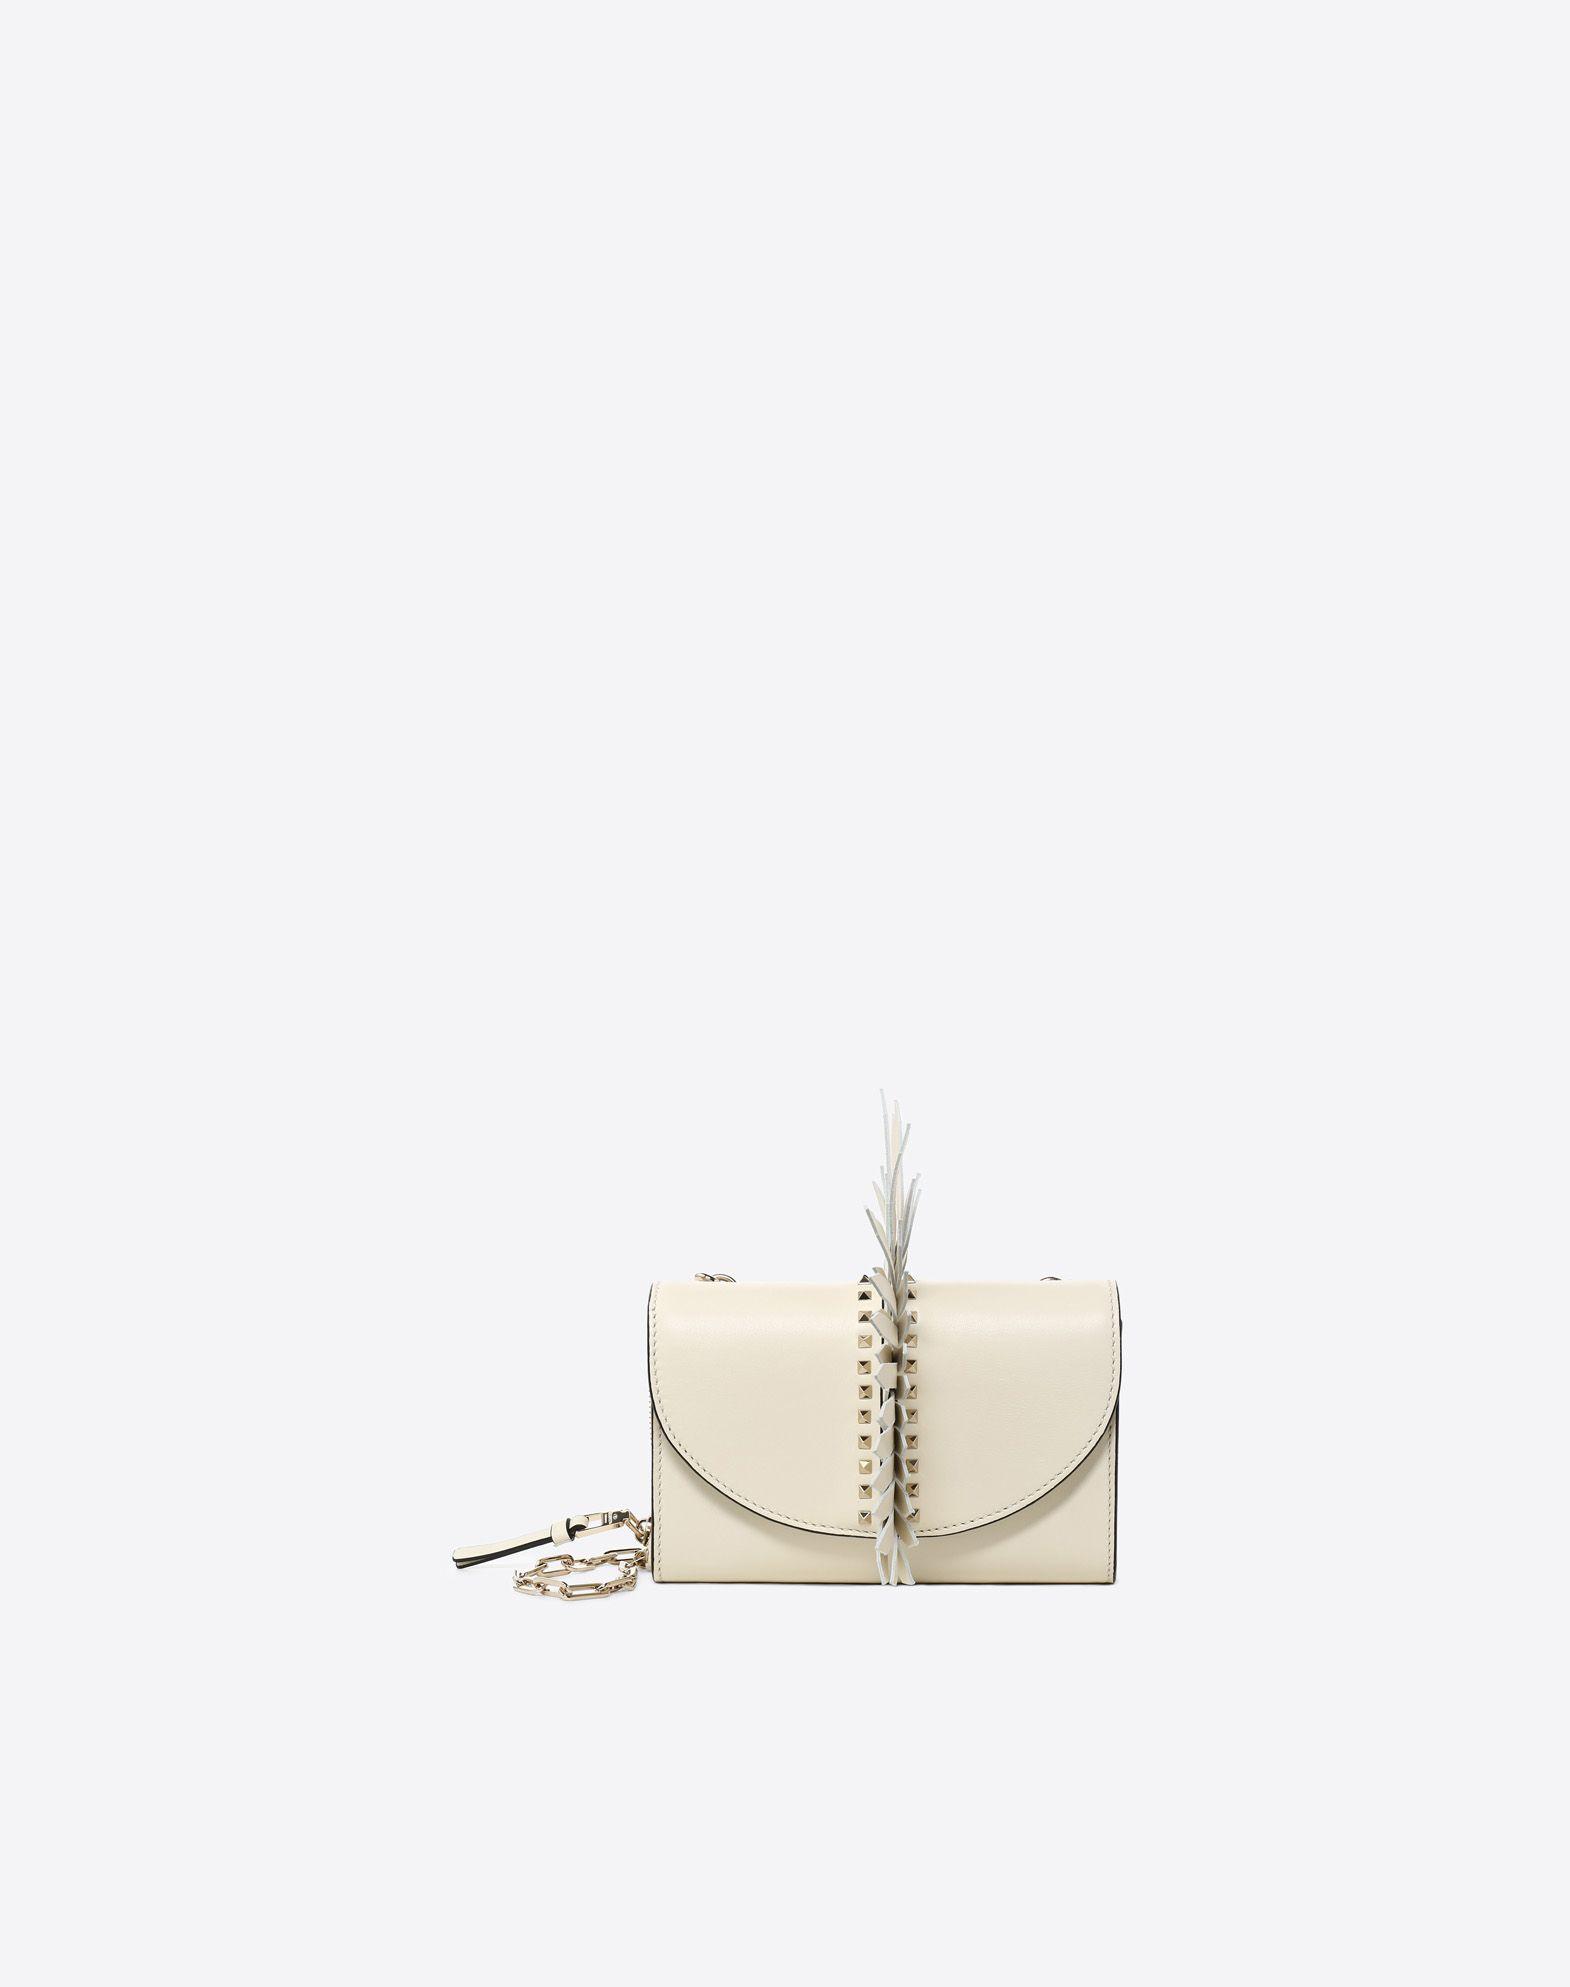 VALENTINO GARAVANI Shoulder Bag CROSS BODY BAG D f